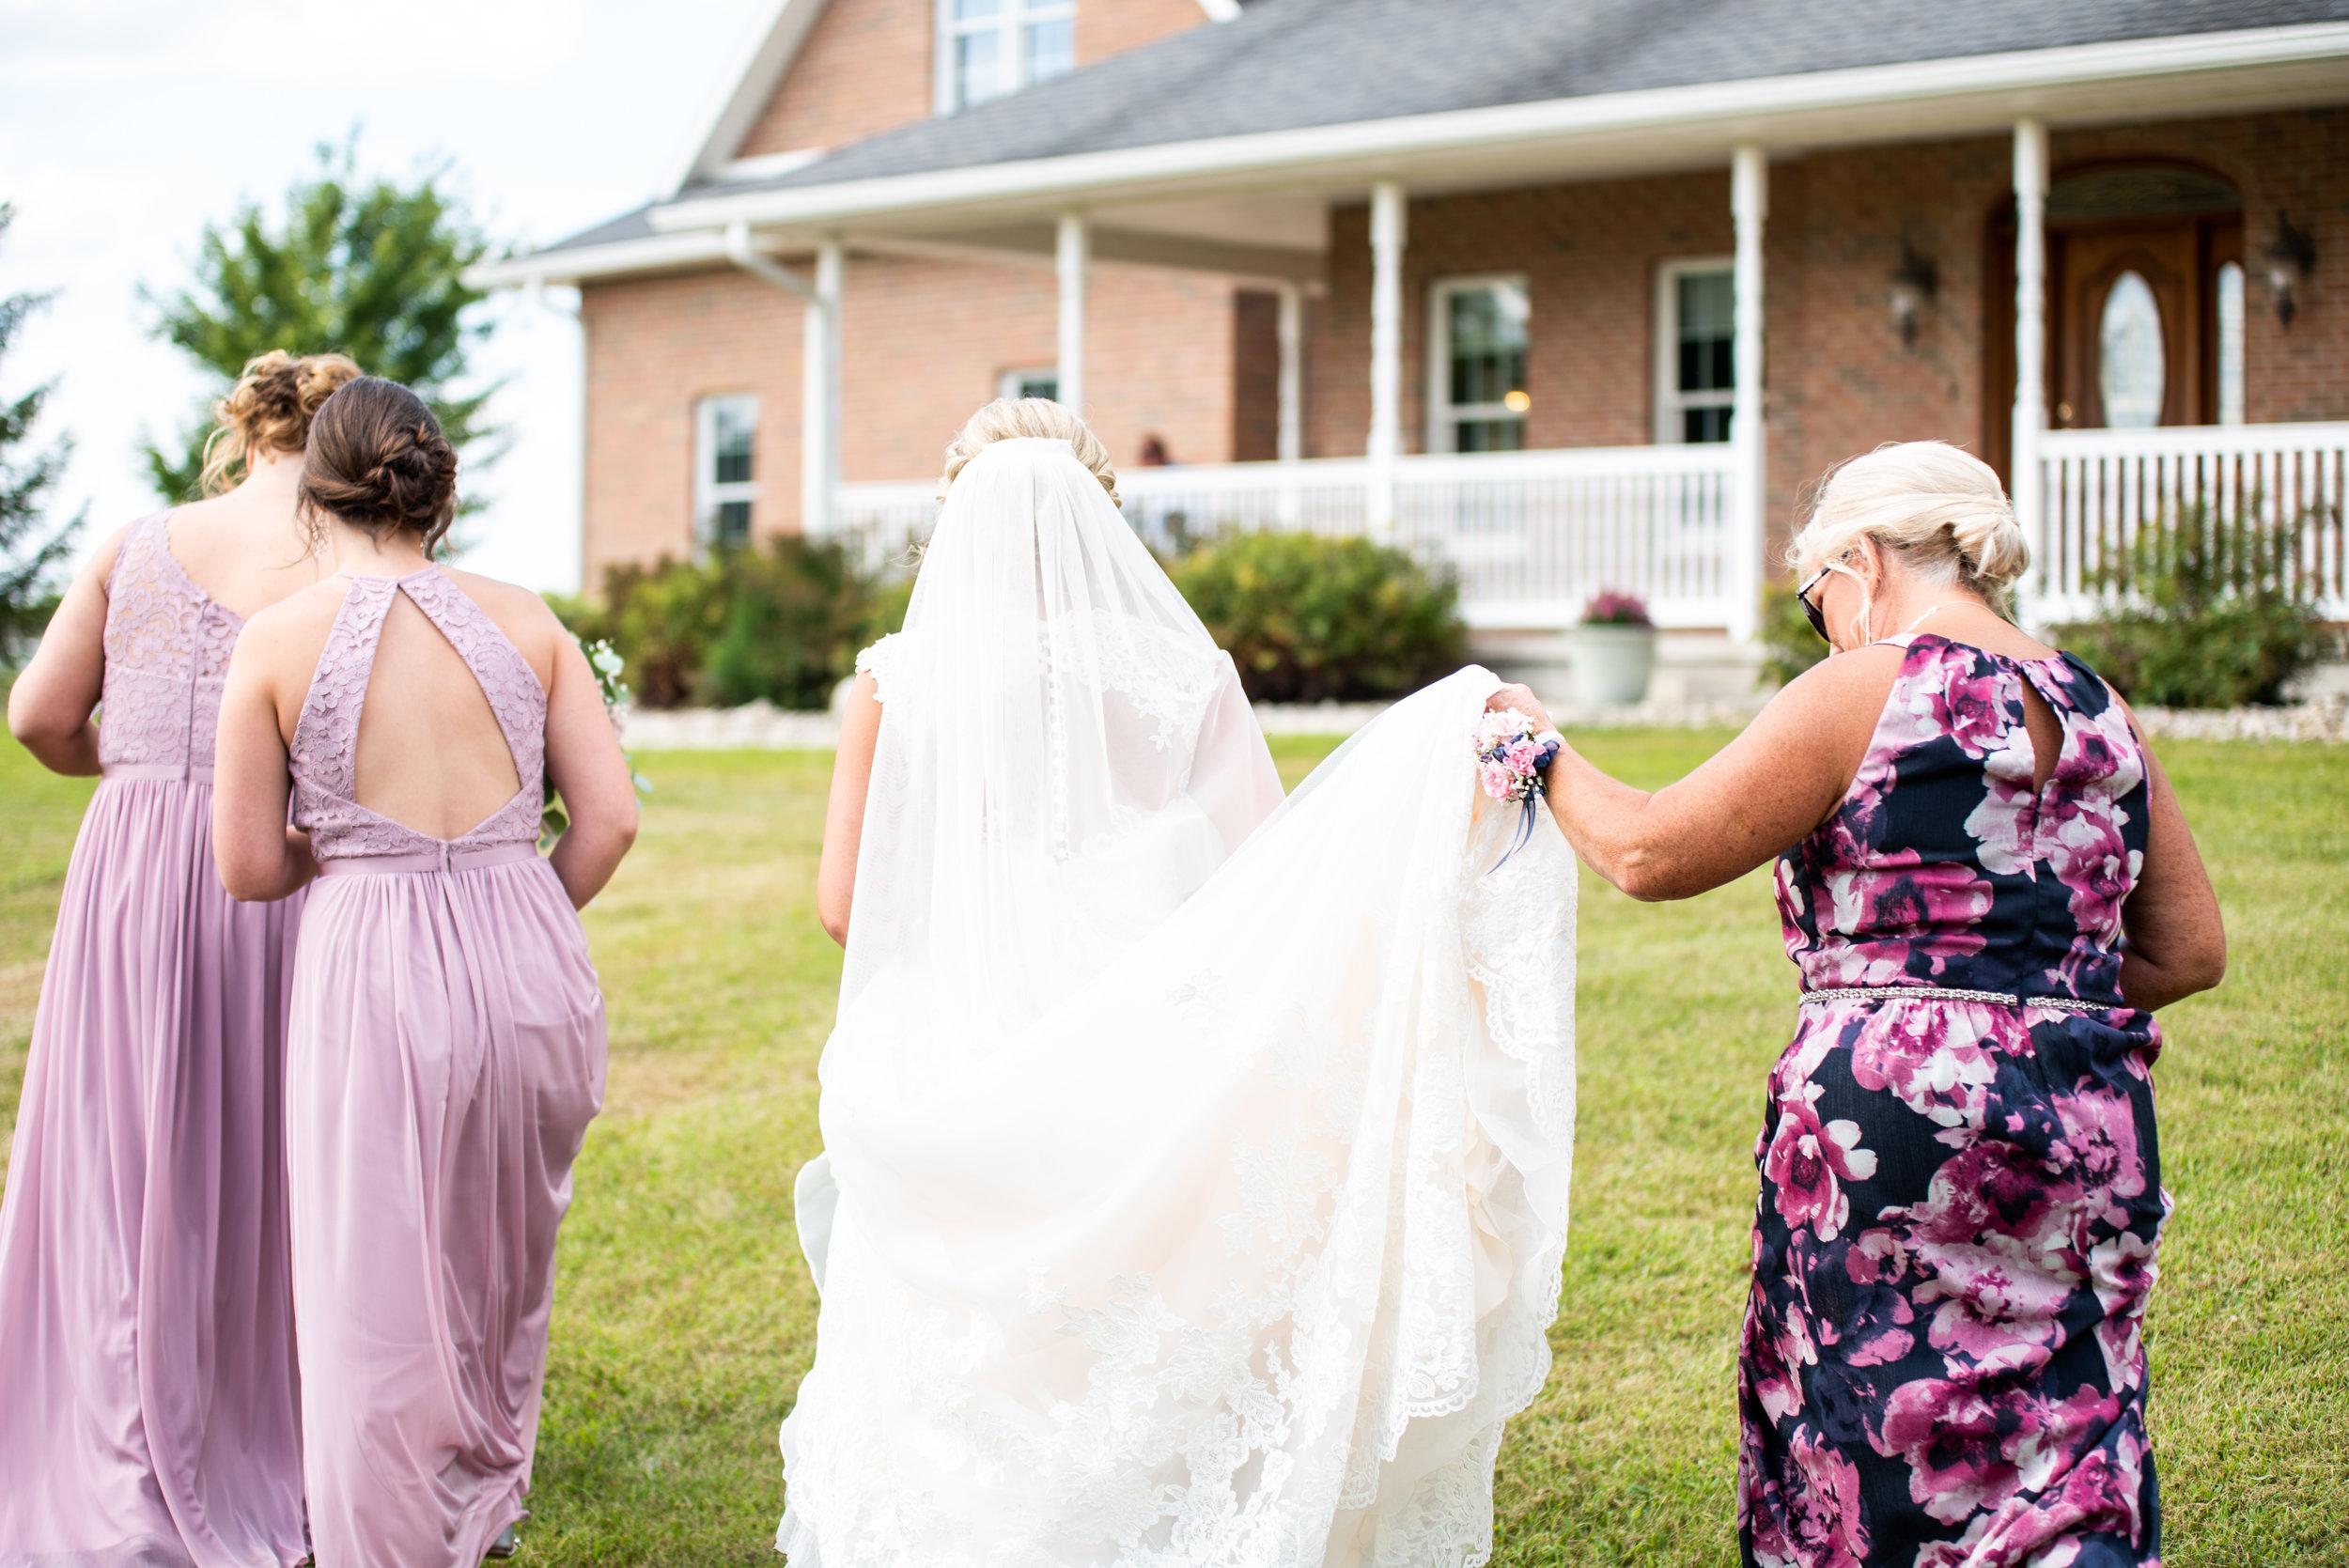 wedding (1 of 1)-47.jpg